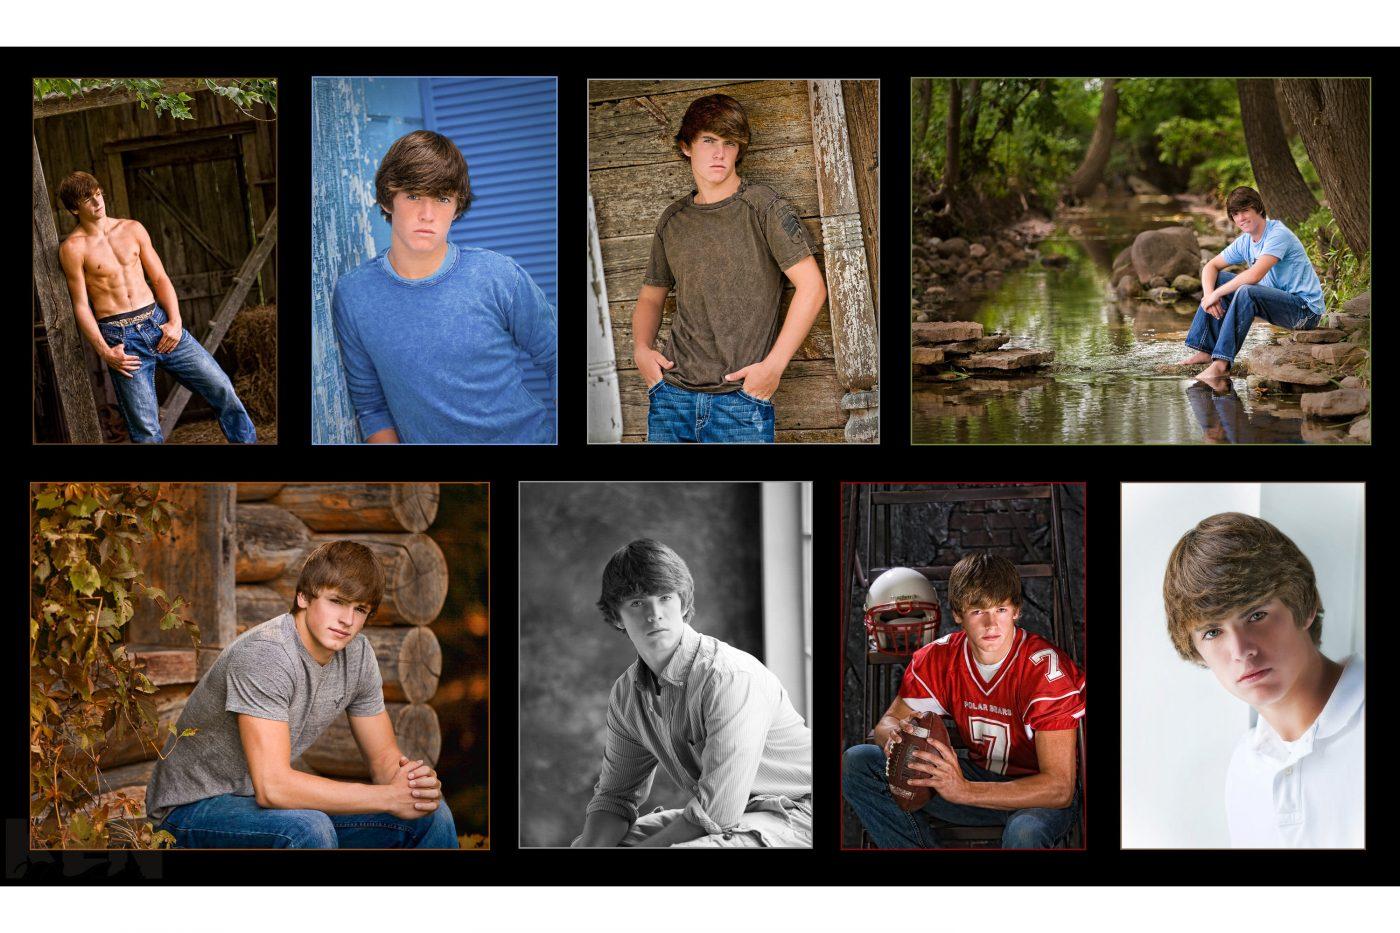 8 images high school senior boy